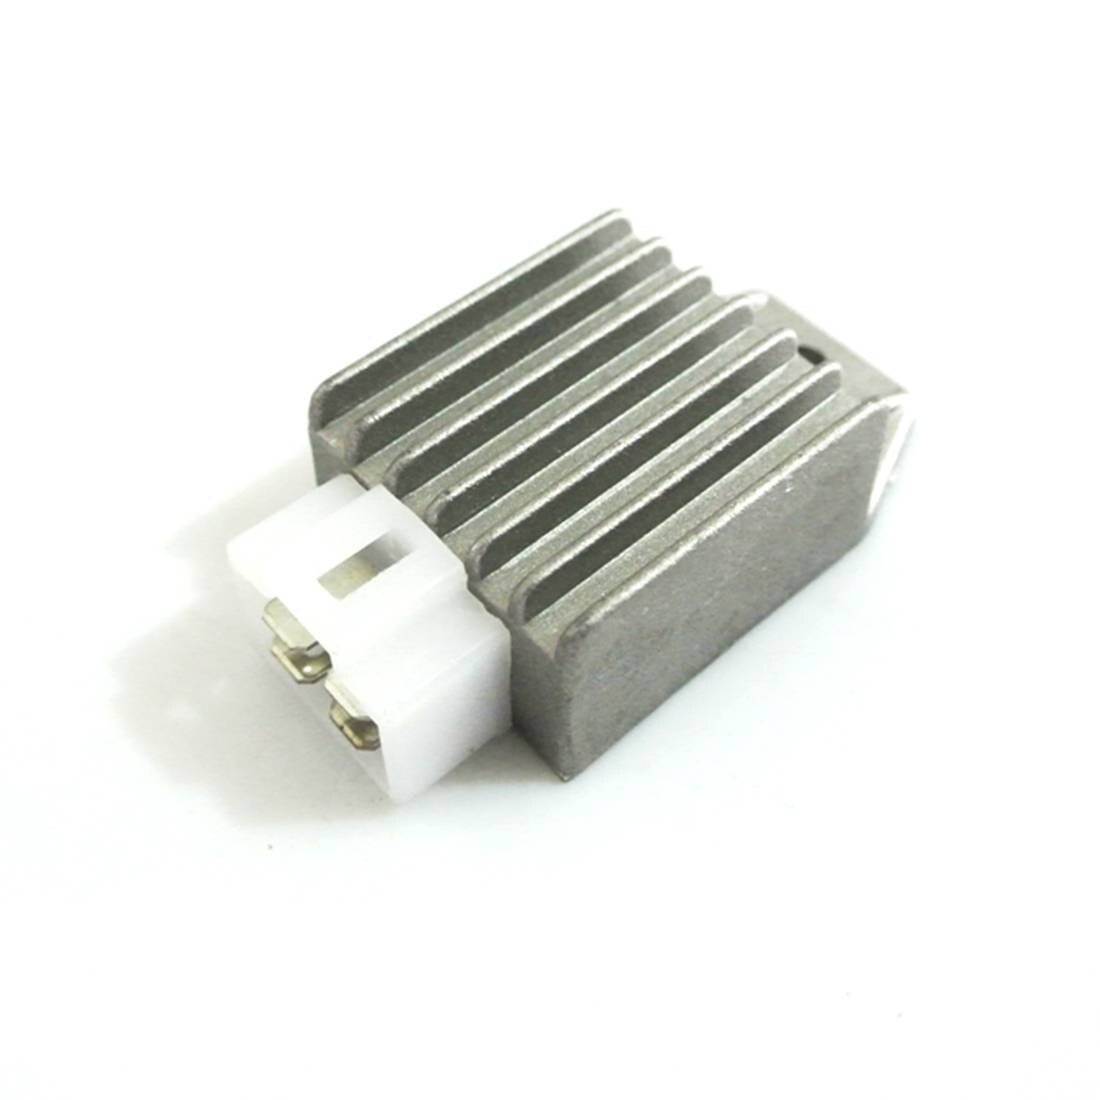 4Pin 12V регулятор напряжения Выпрямитель для ATV GY6 QMB139 50cc 150cc Скутер мопед